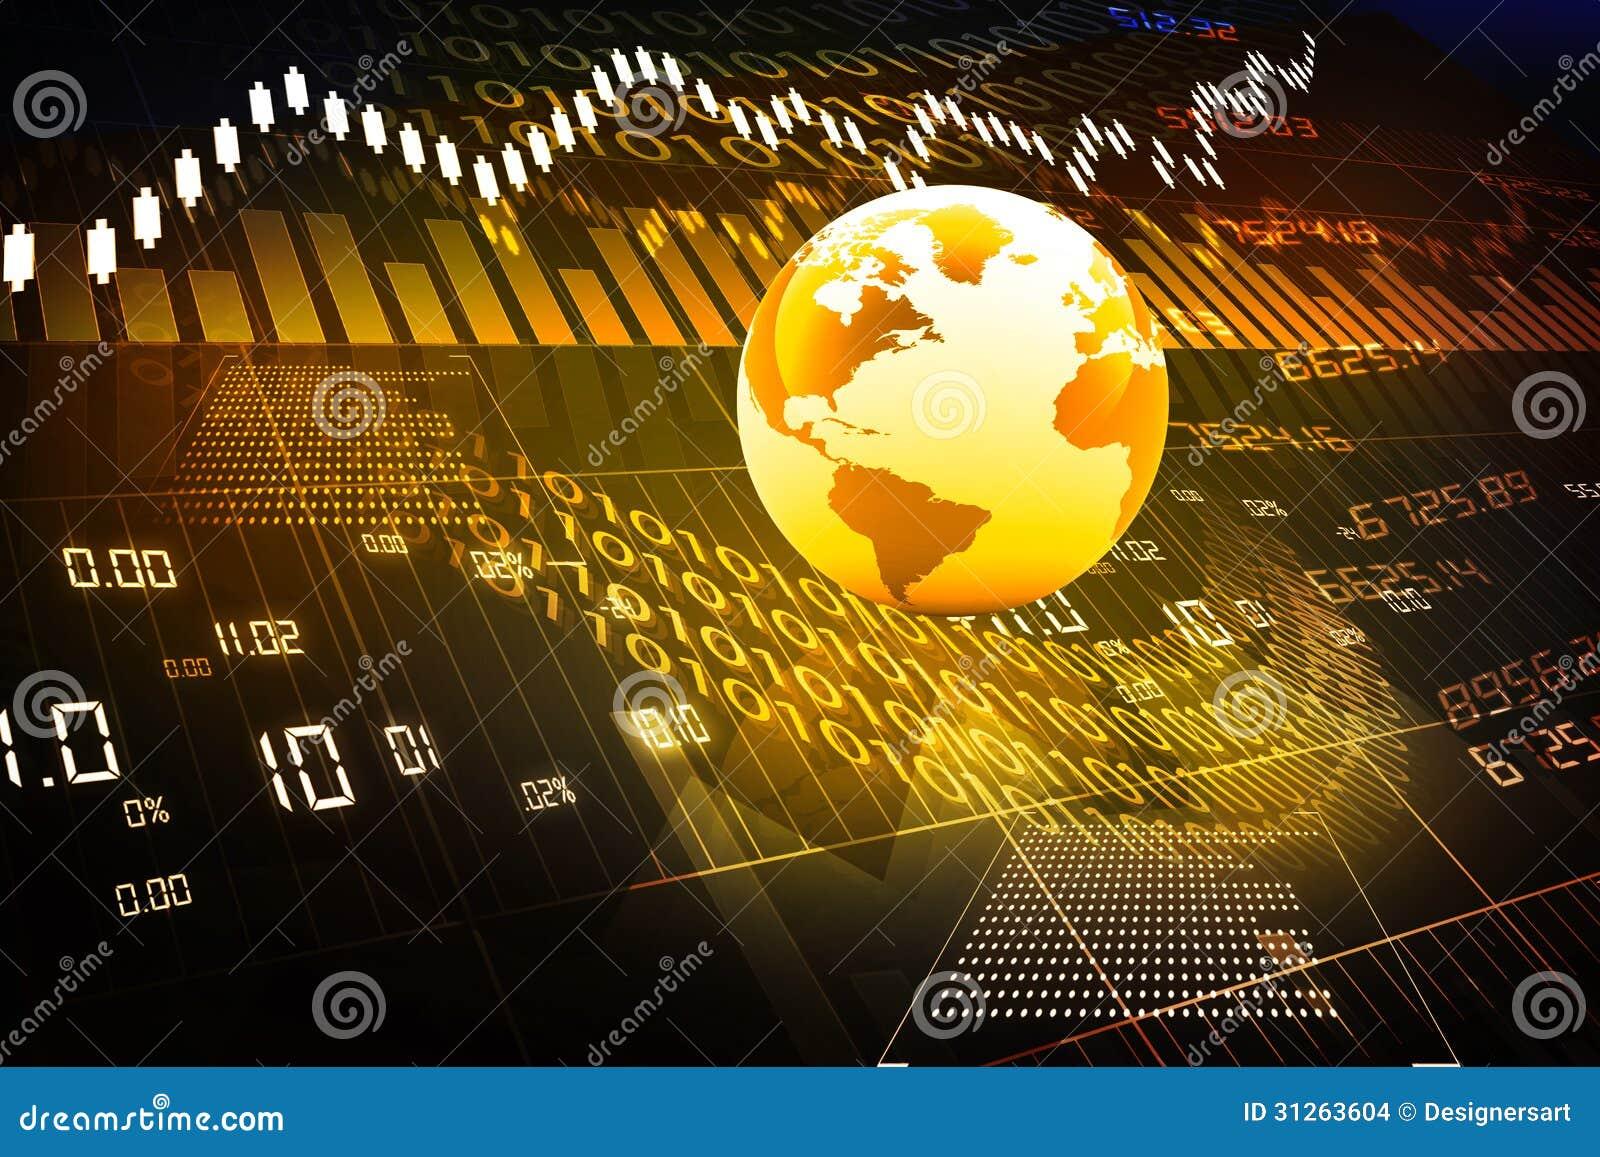 Global Stock Market Stock Images - Image: 31263604